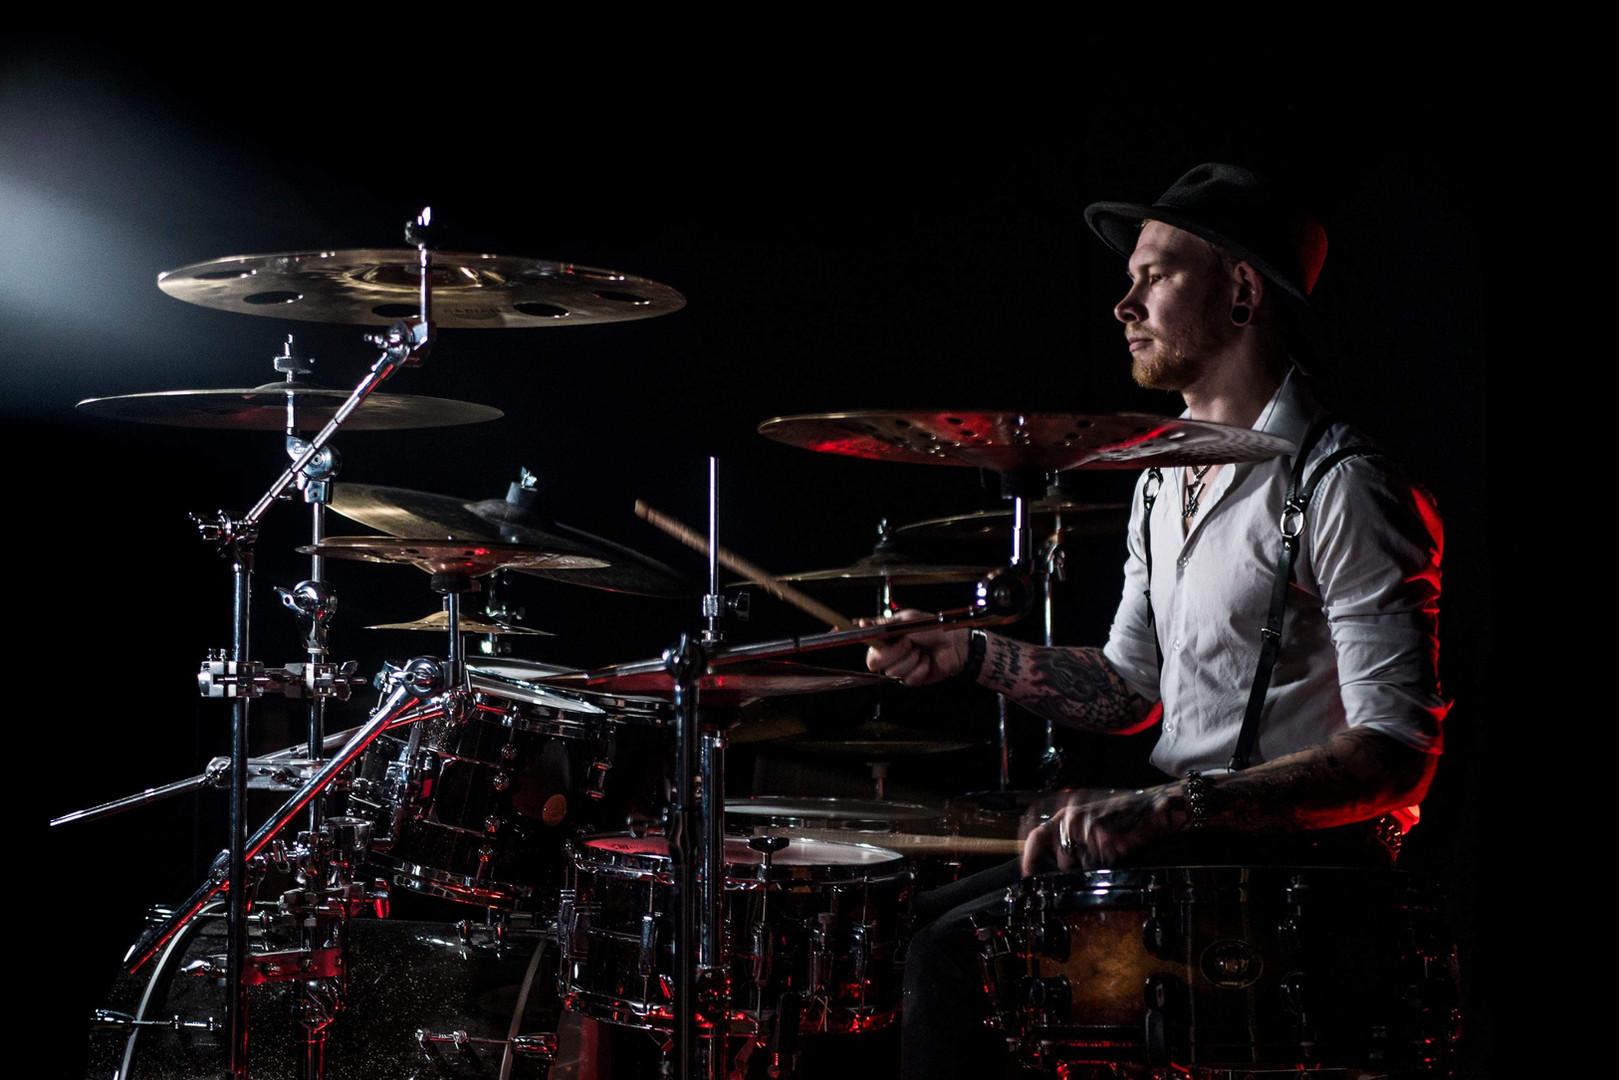 Simon Uselis - Drumming